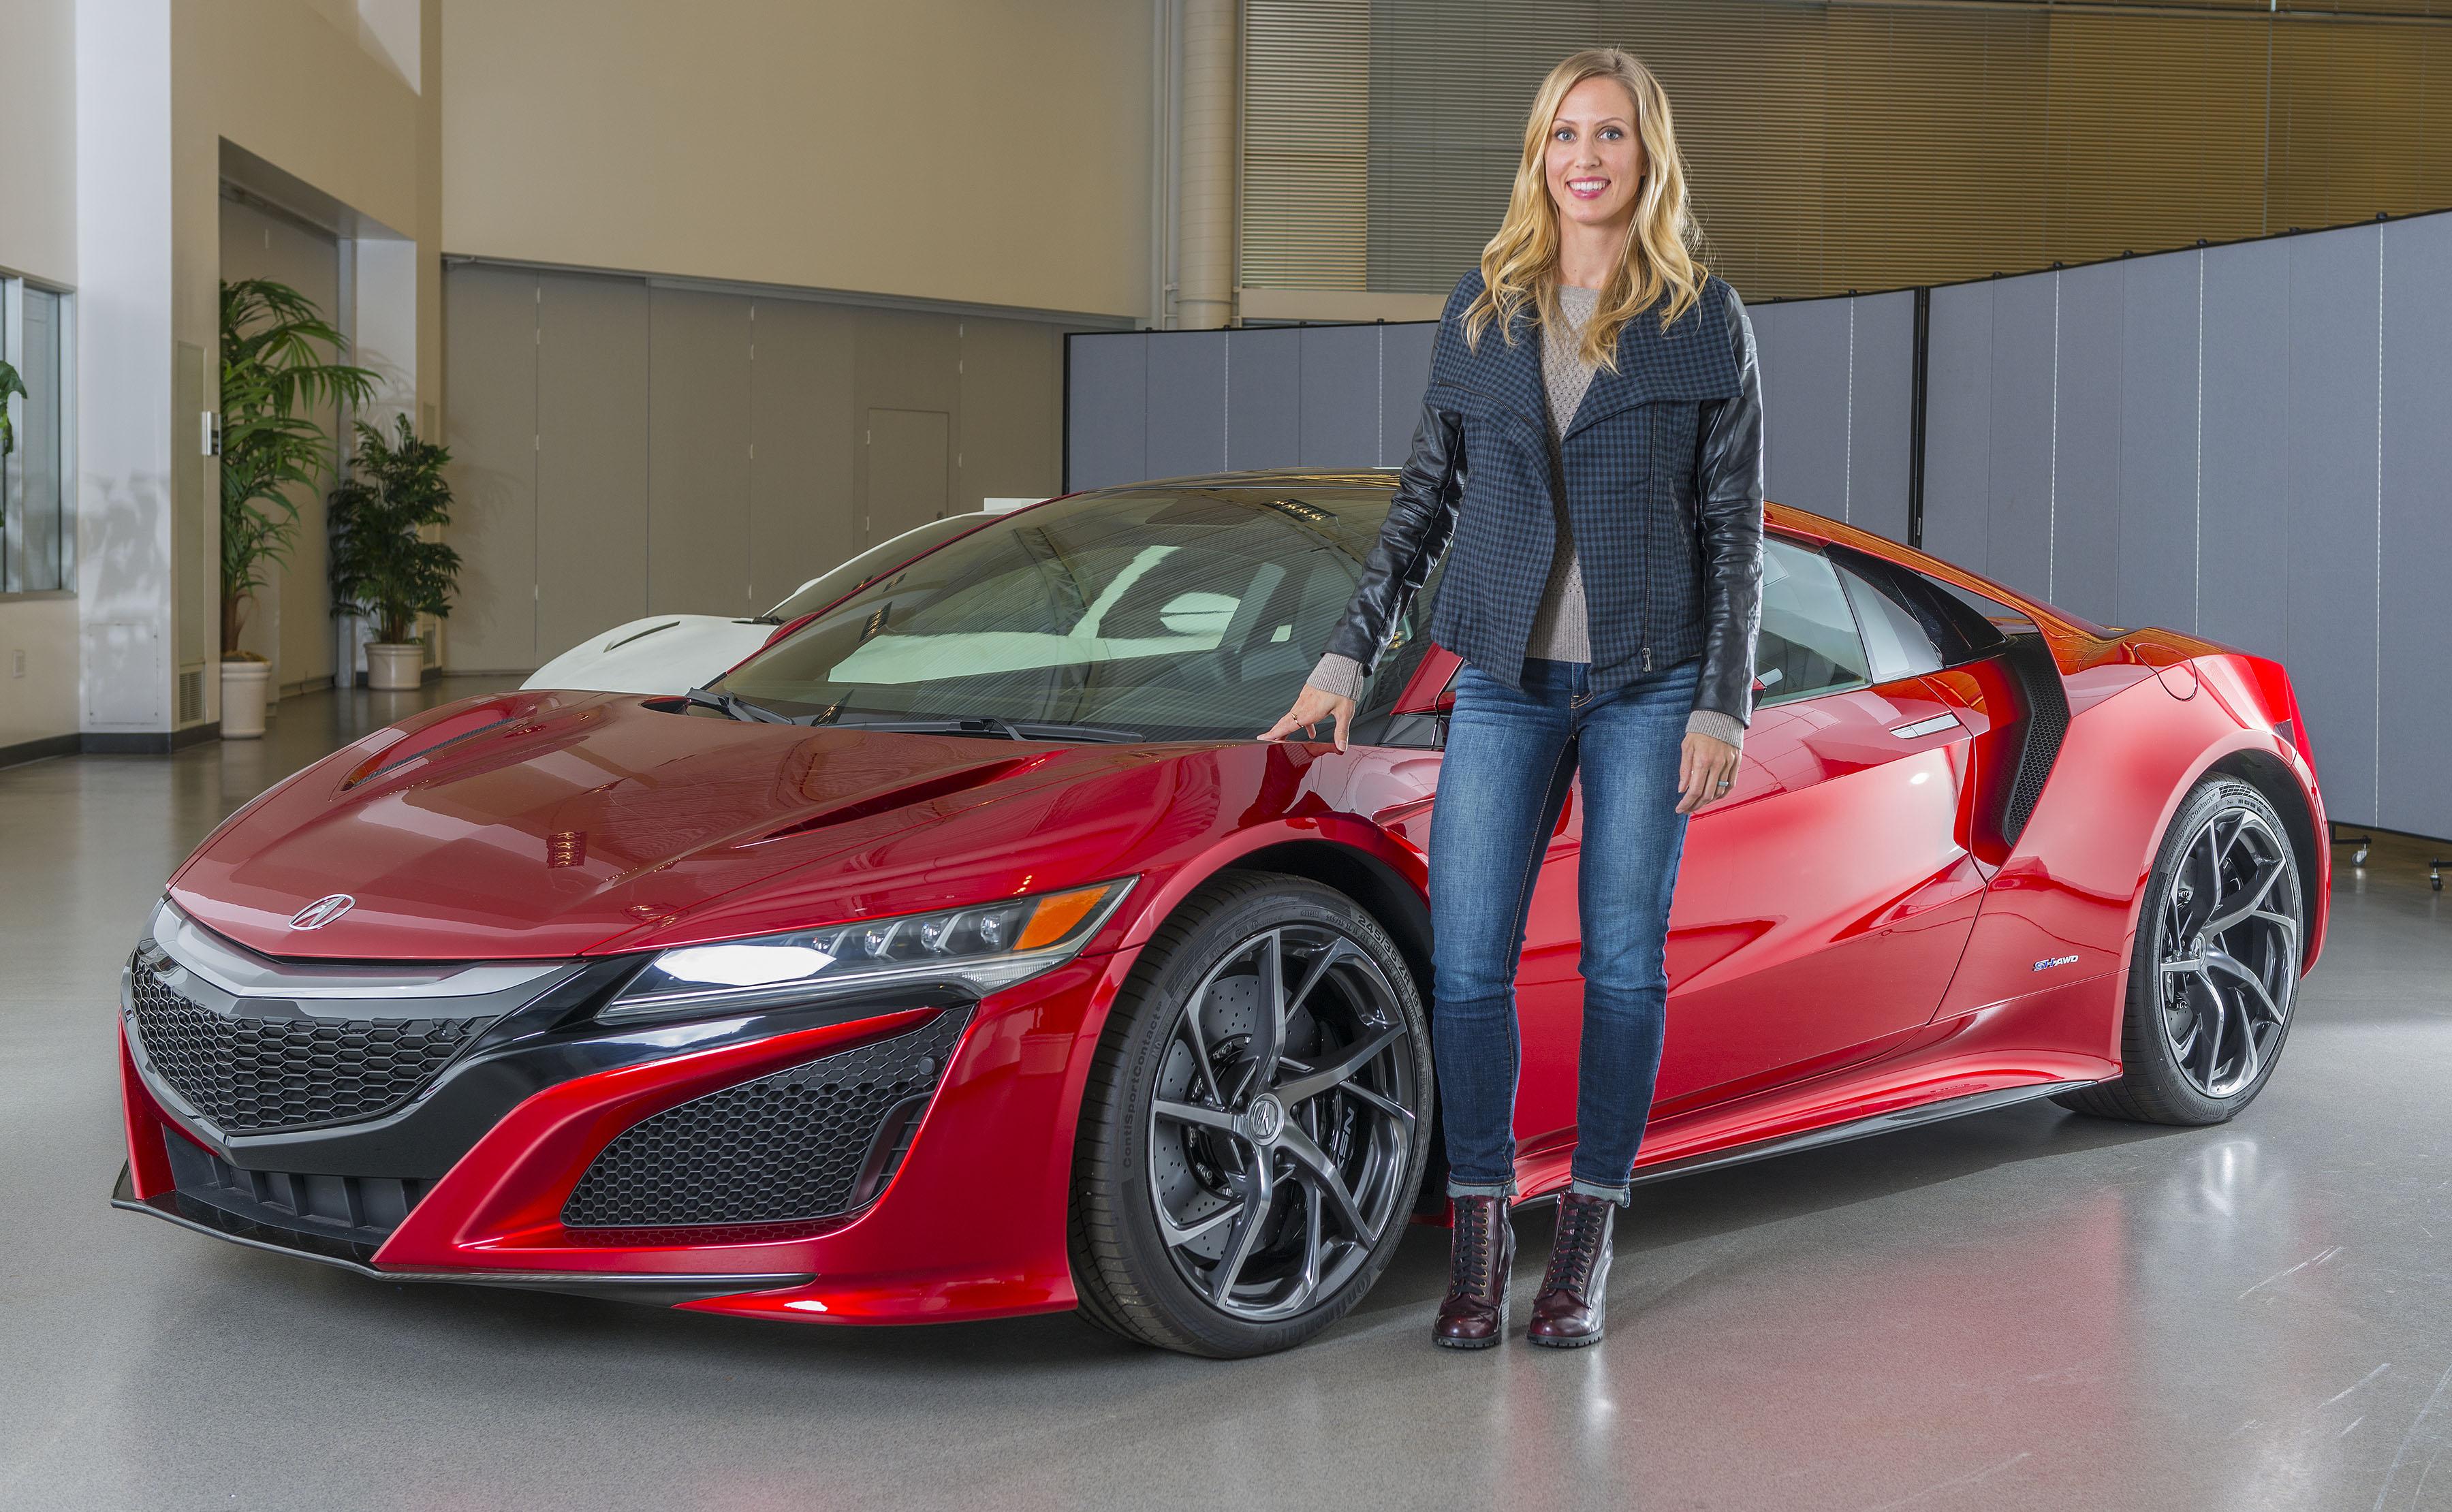 Michelle Christensen, Acura NSX exterior design lead